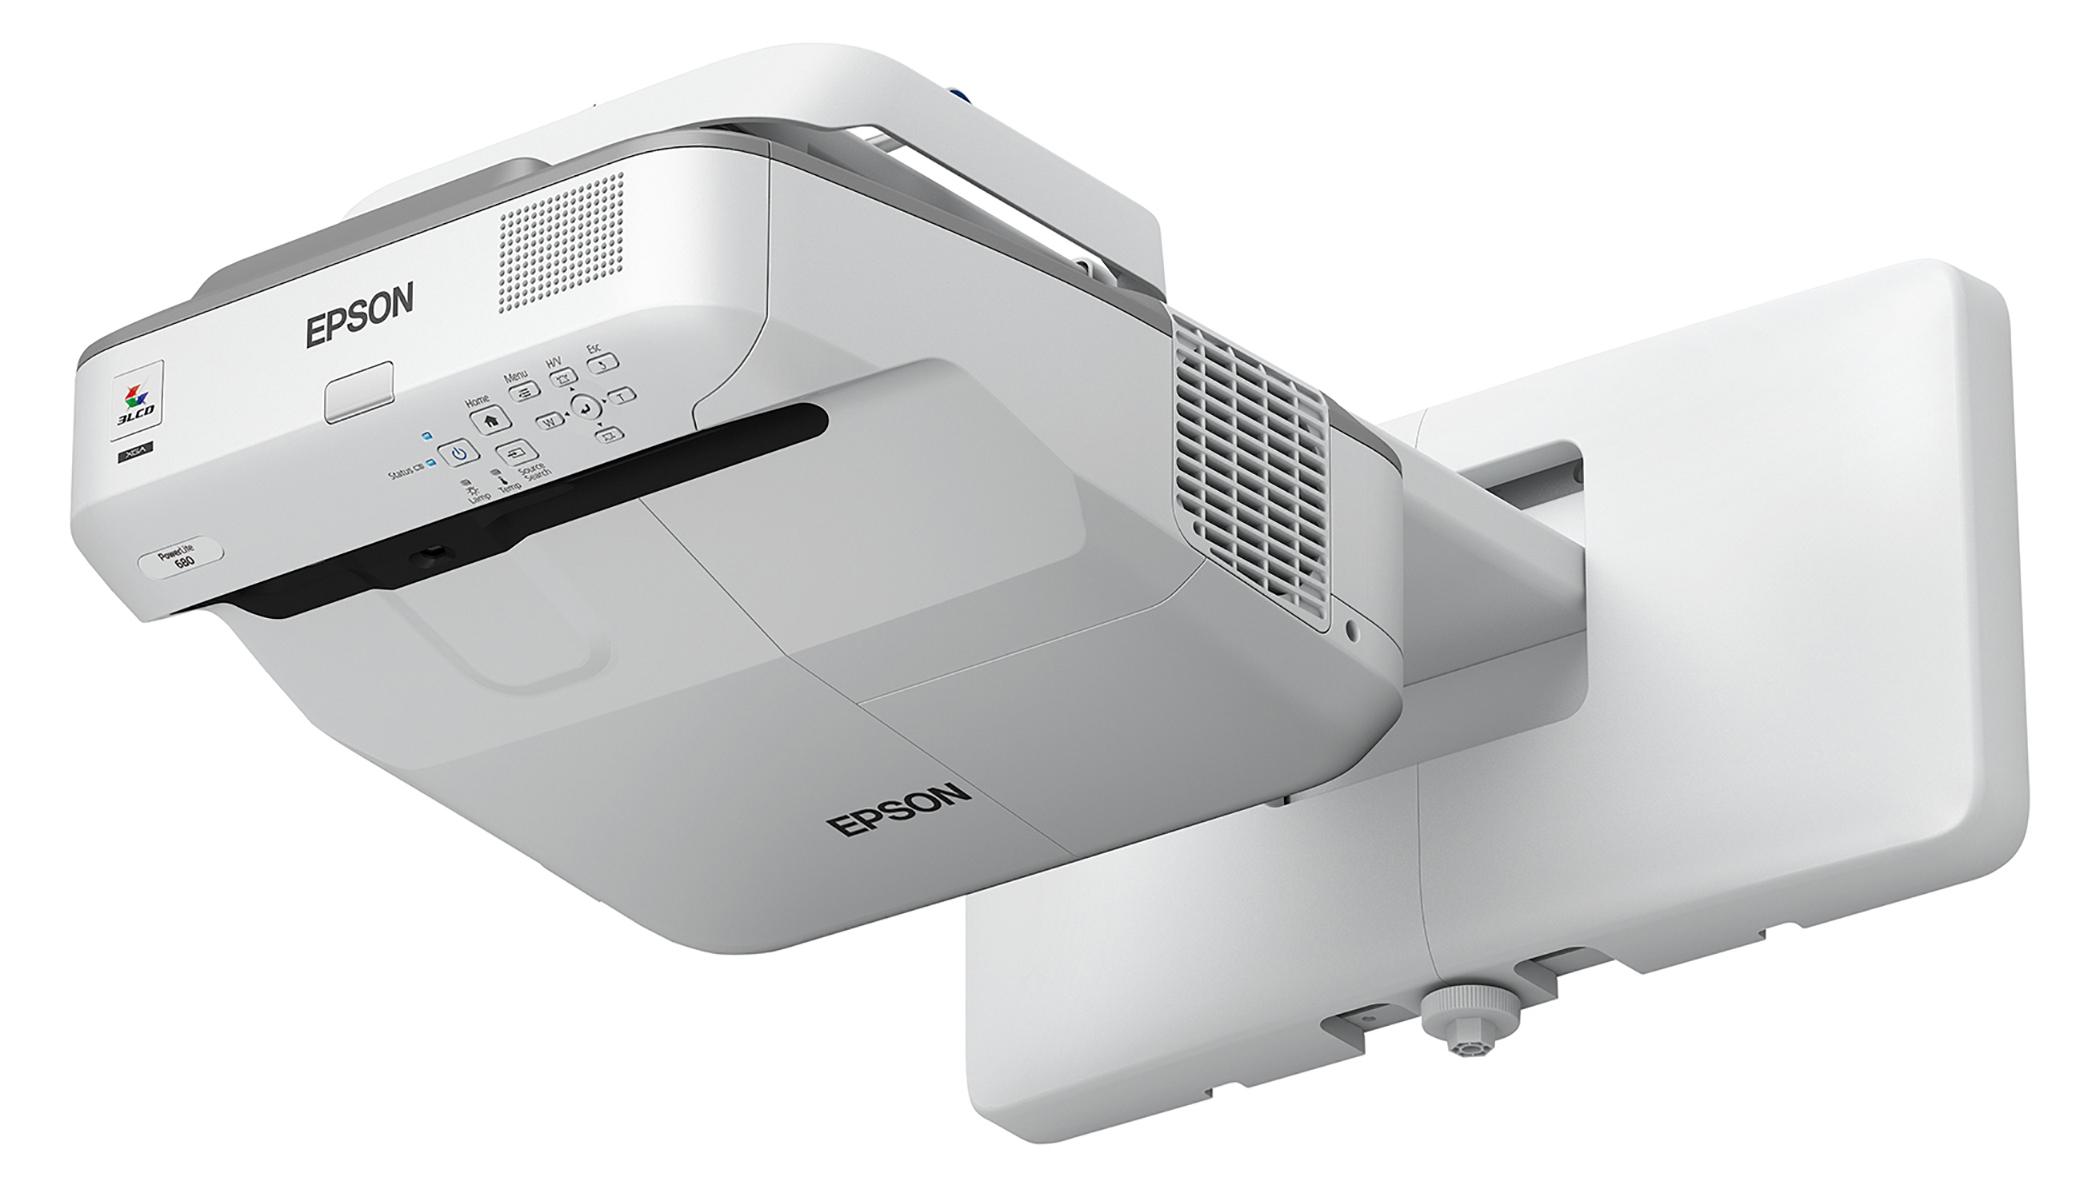 EPSON PowerLite 680 3500lm XGA Ultra Short-Throw Projector, Refurbished